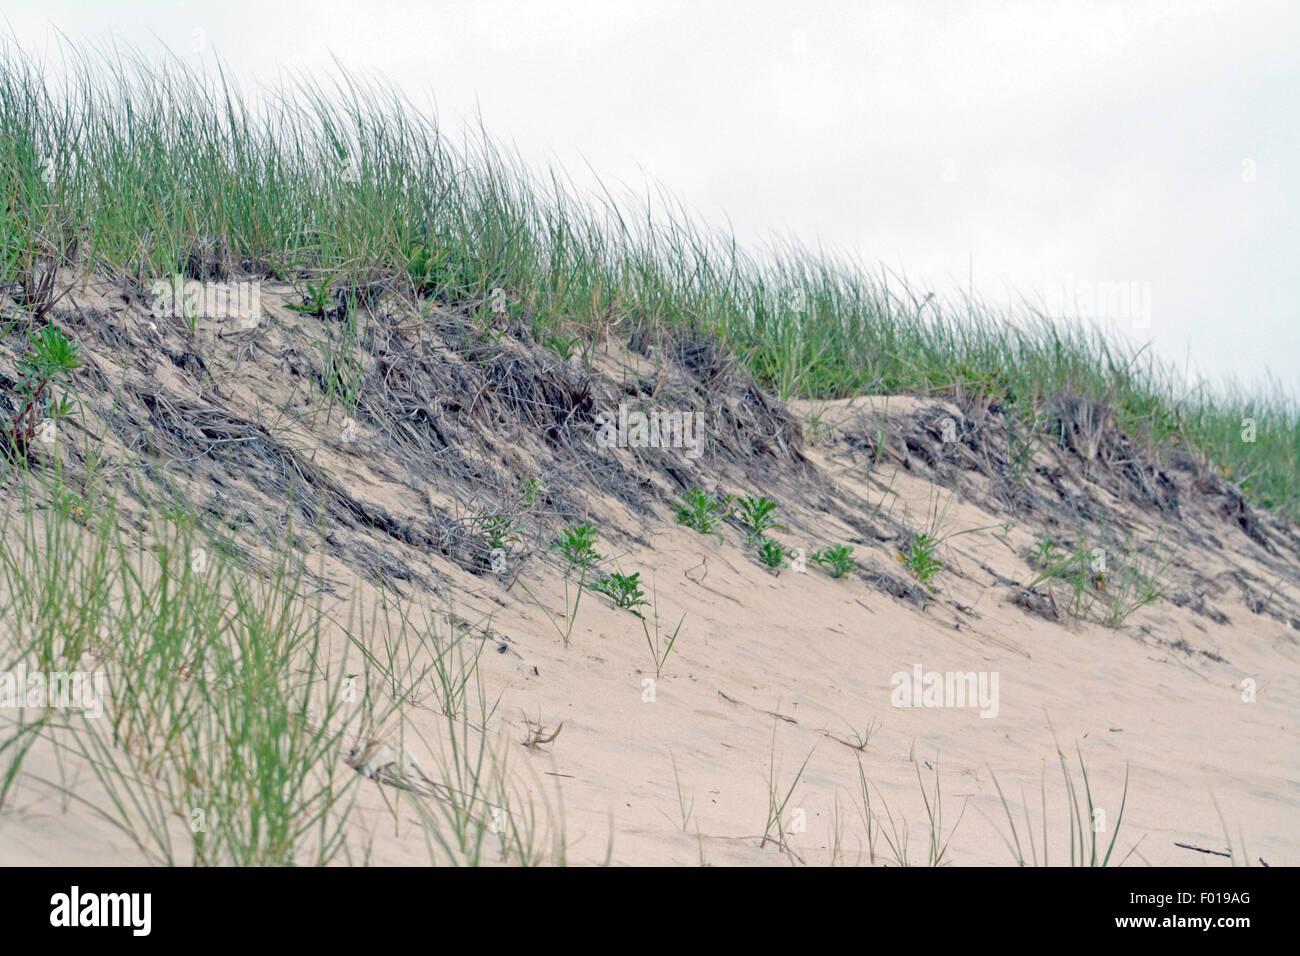 Sand Dune with Beach Grass Montauk Long Island New York - Stock Image